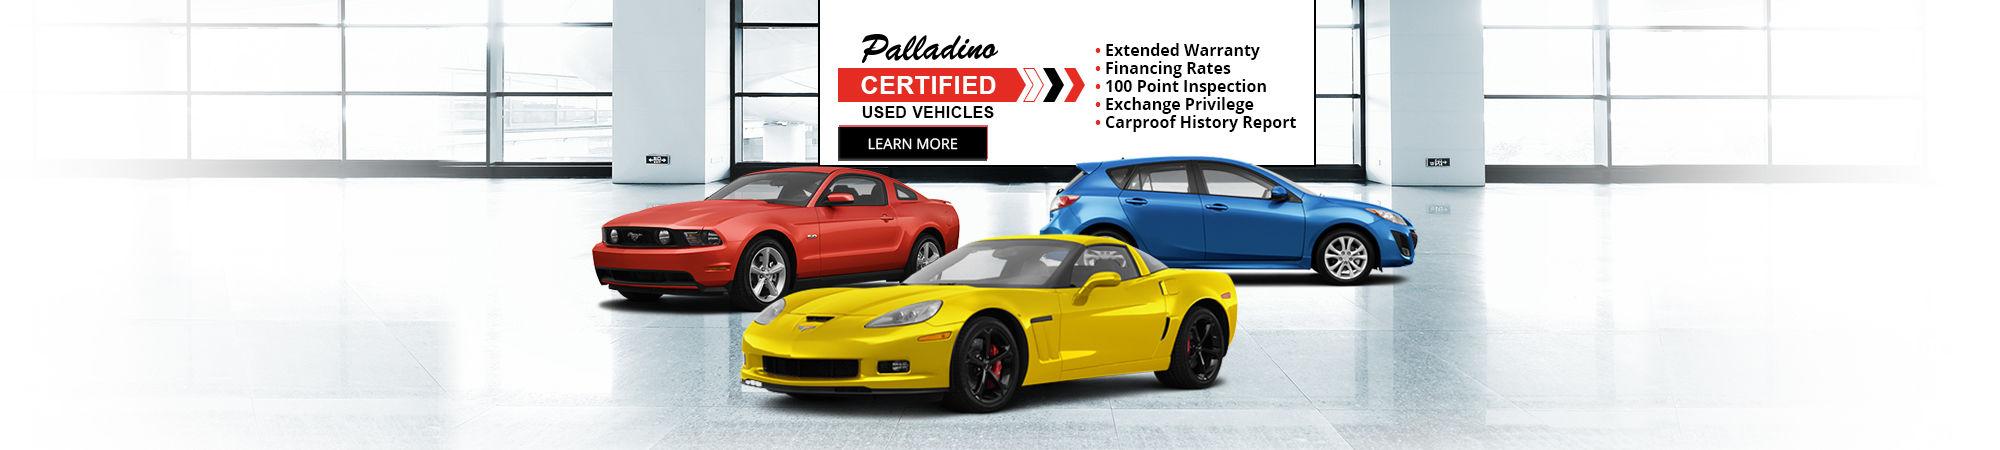 Palladino Certified